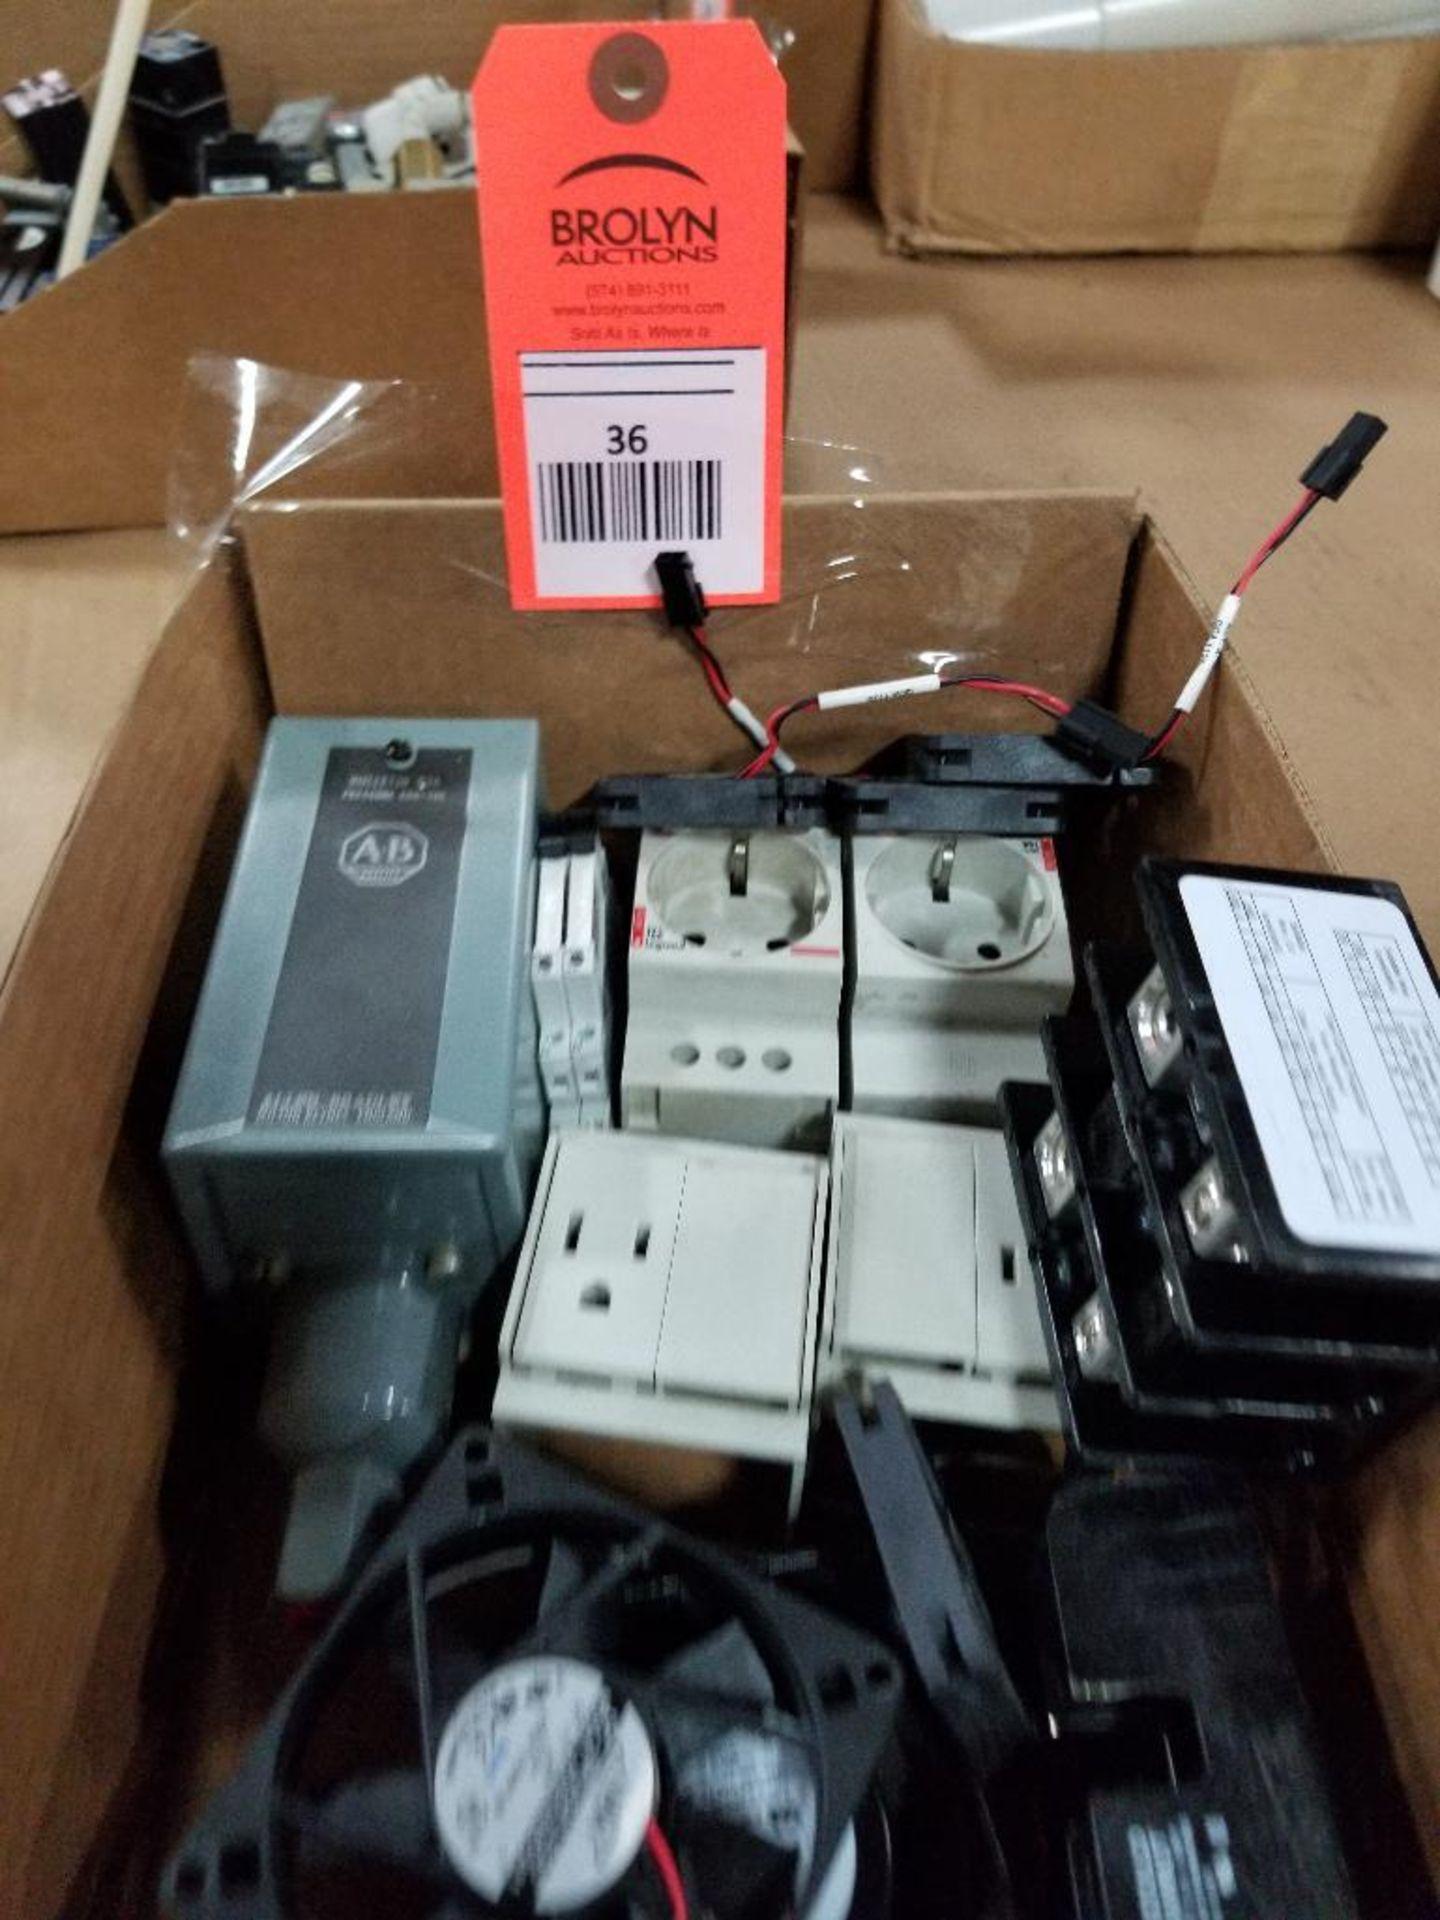 Assorted electrical. Allen Bradley, ADDA, Dayton, Sunon, Legrand.